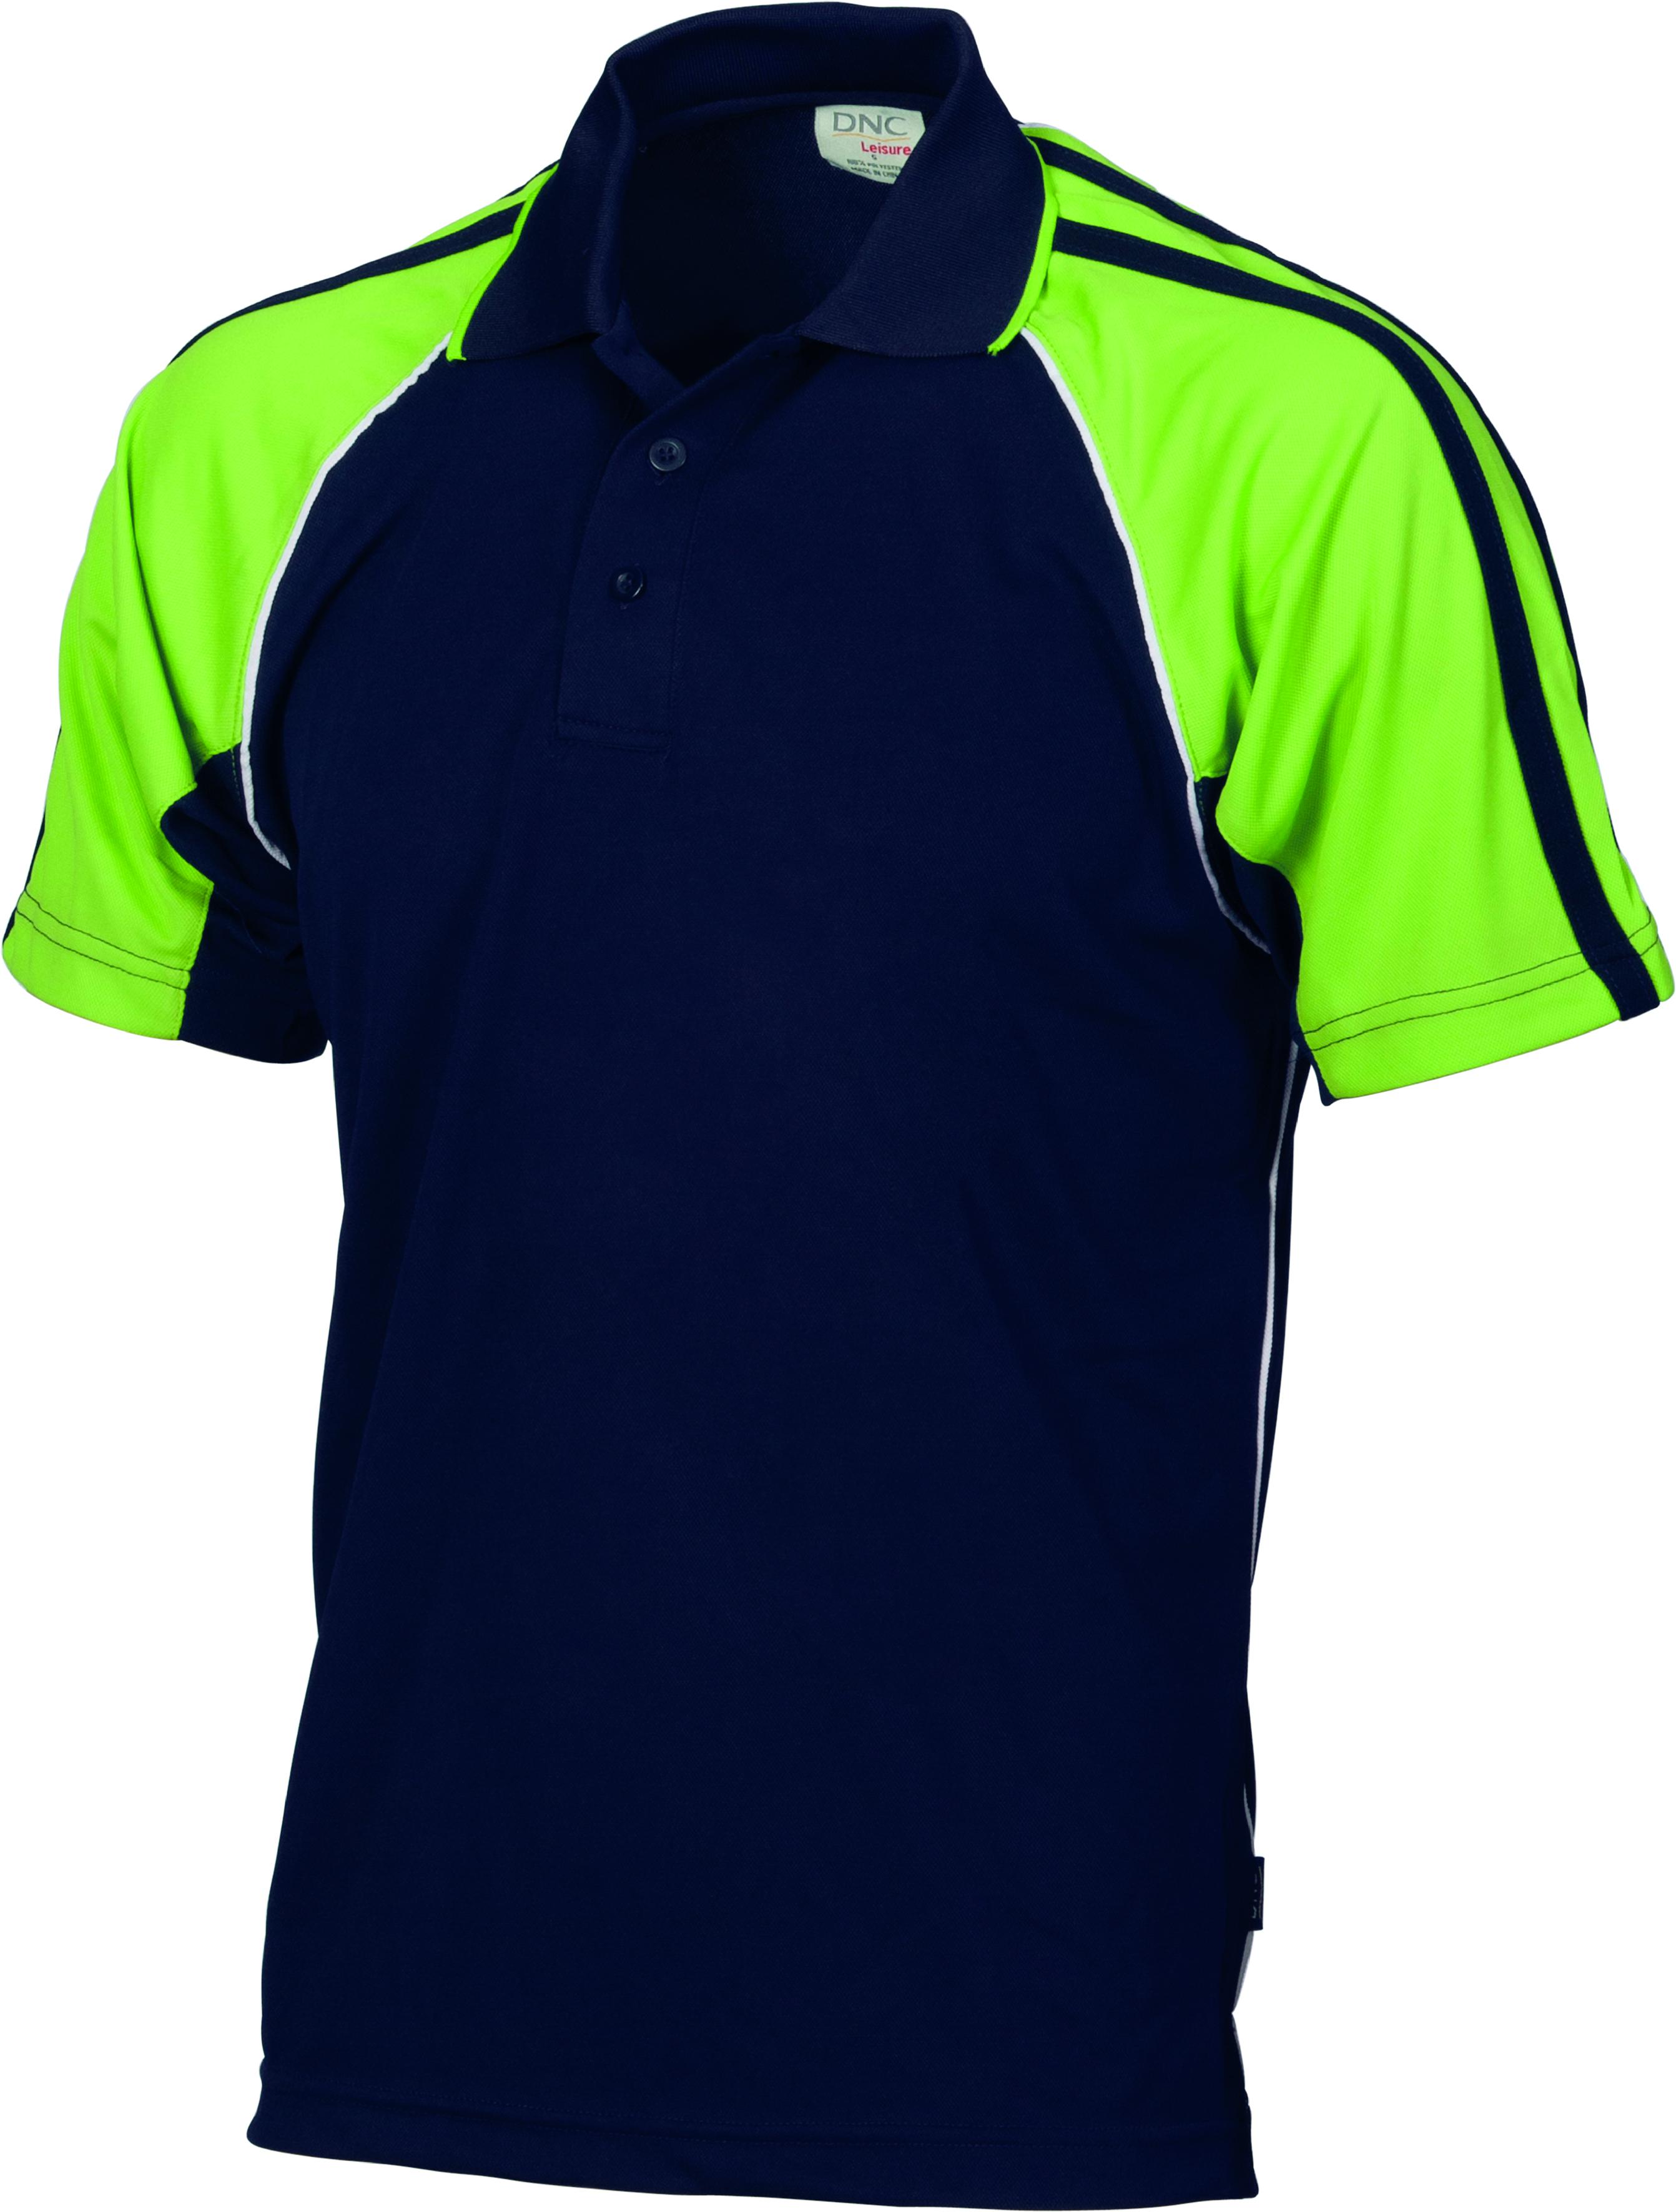 b362ca2e Product Display - DNC Workwear - workwear, work wear, clothing ...